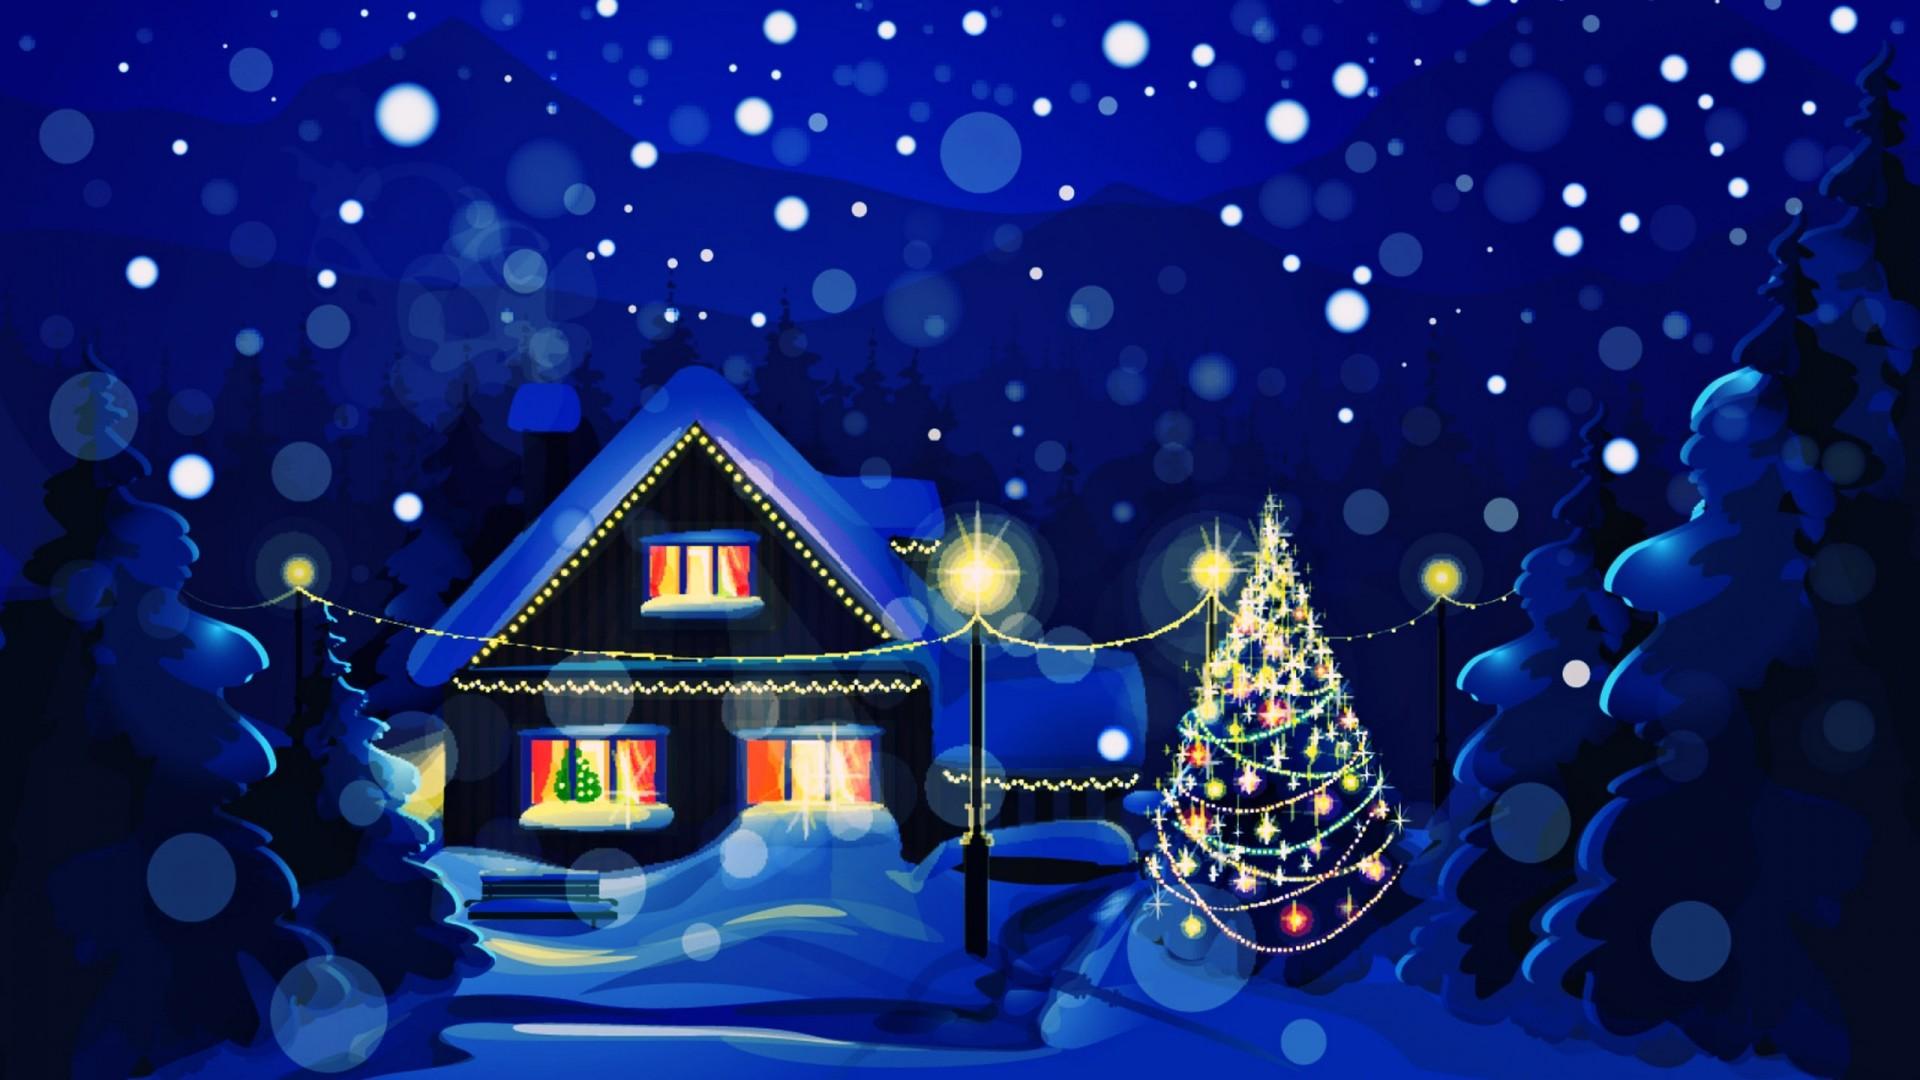 2016-Christmas-hd-wallpaper-desktop